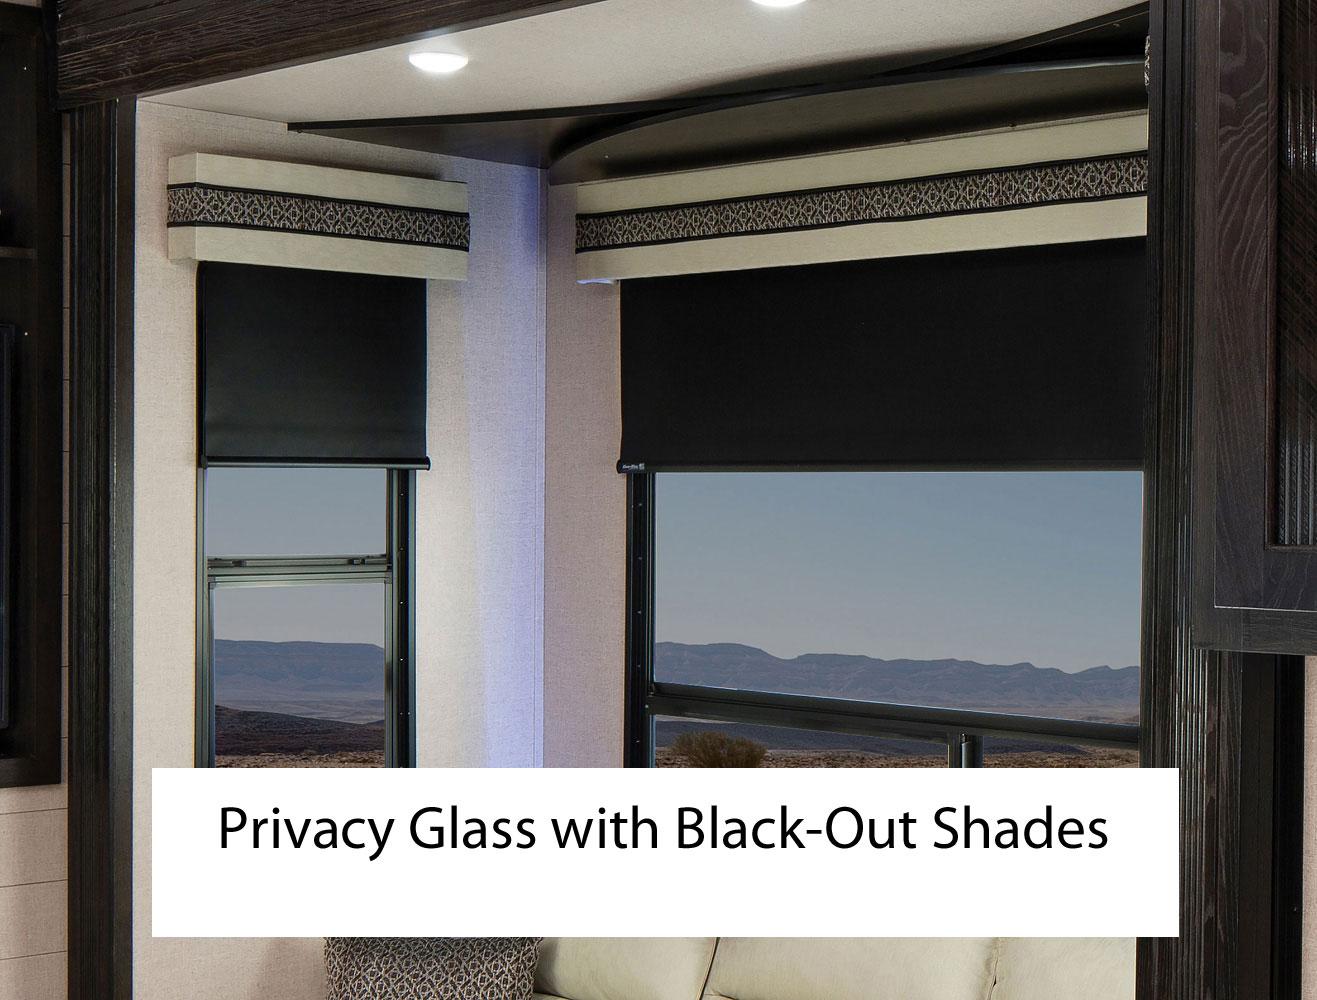 Blackout-window-shades.jpg